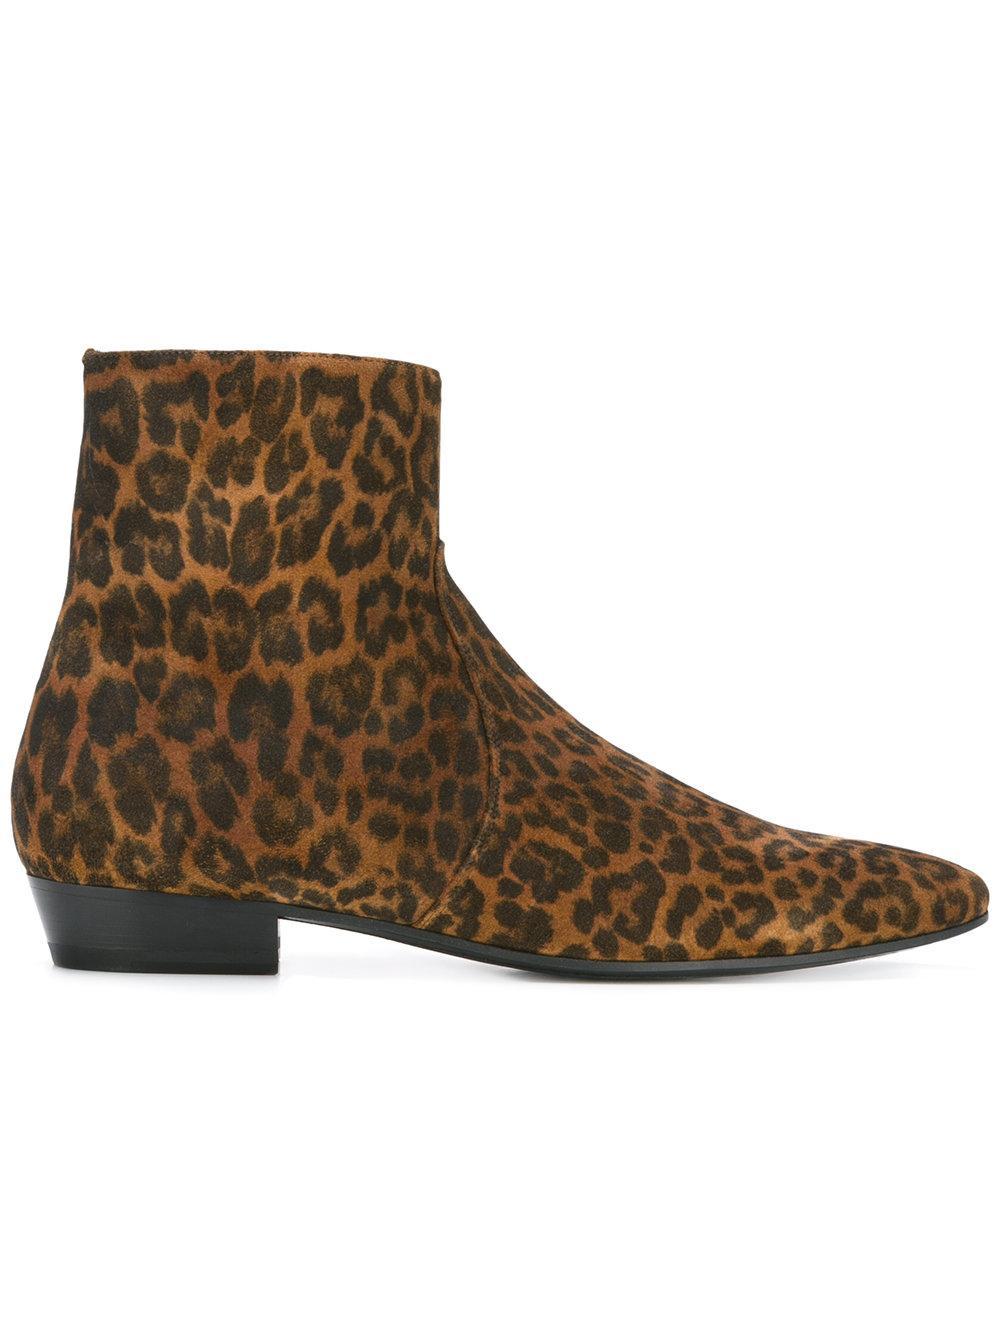 laurent leopard print boot in brown lyst